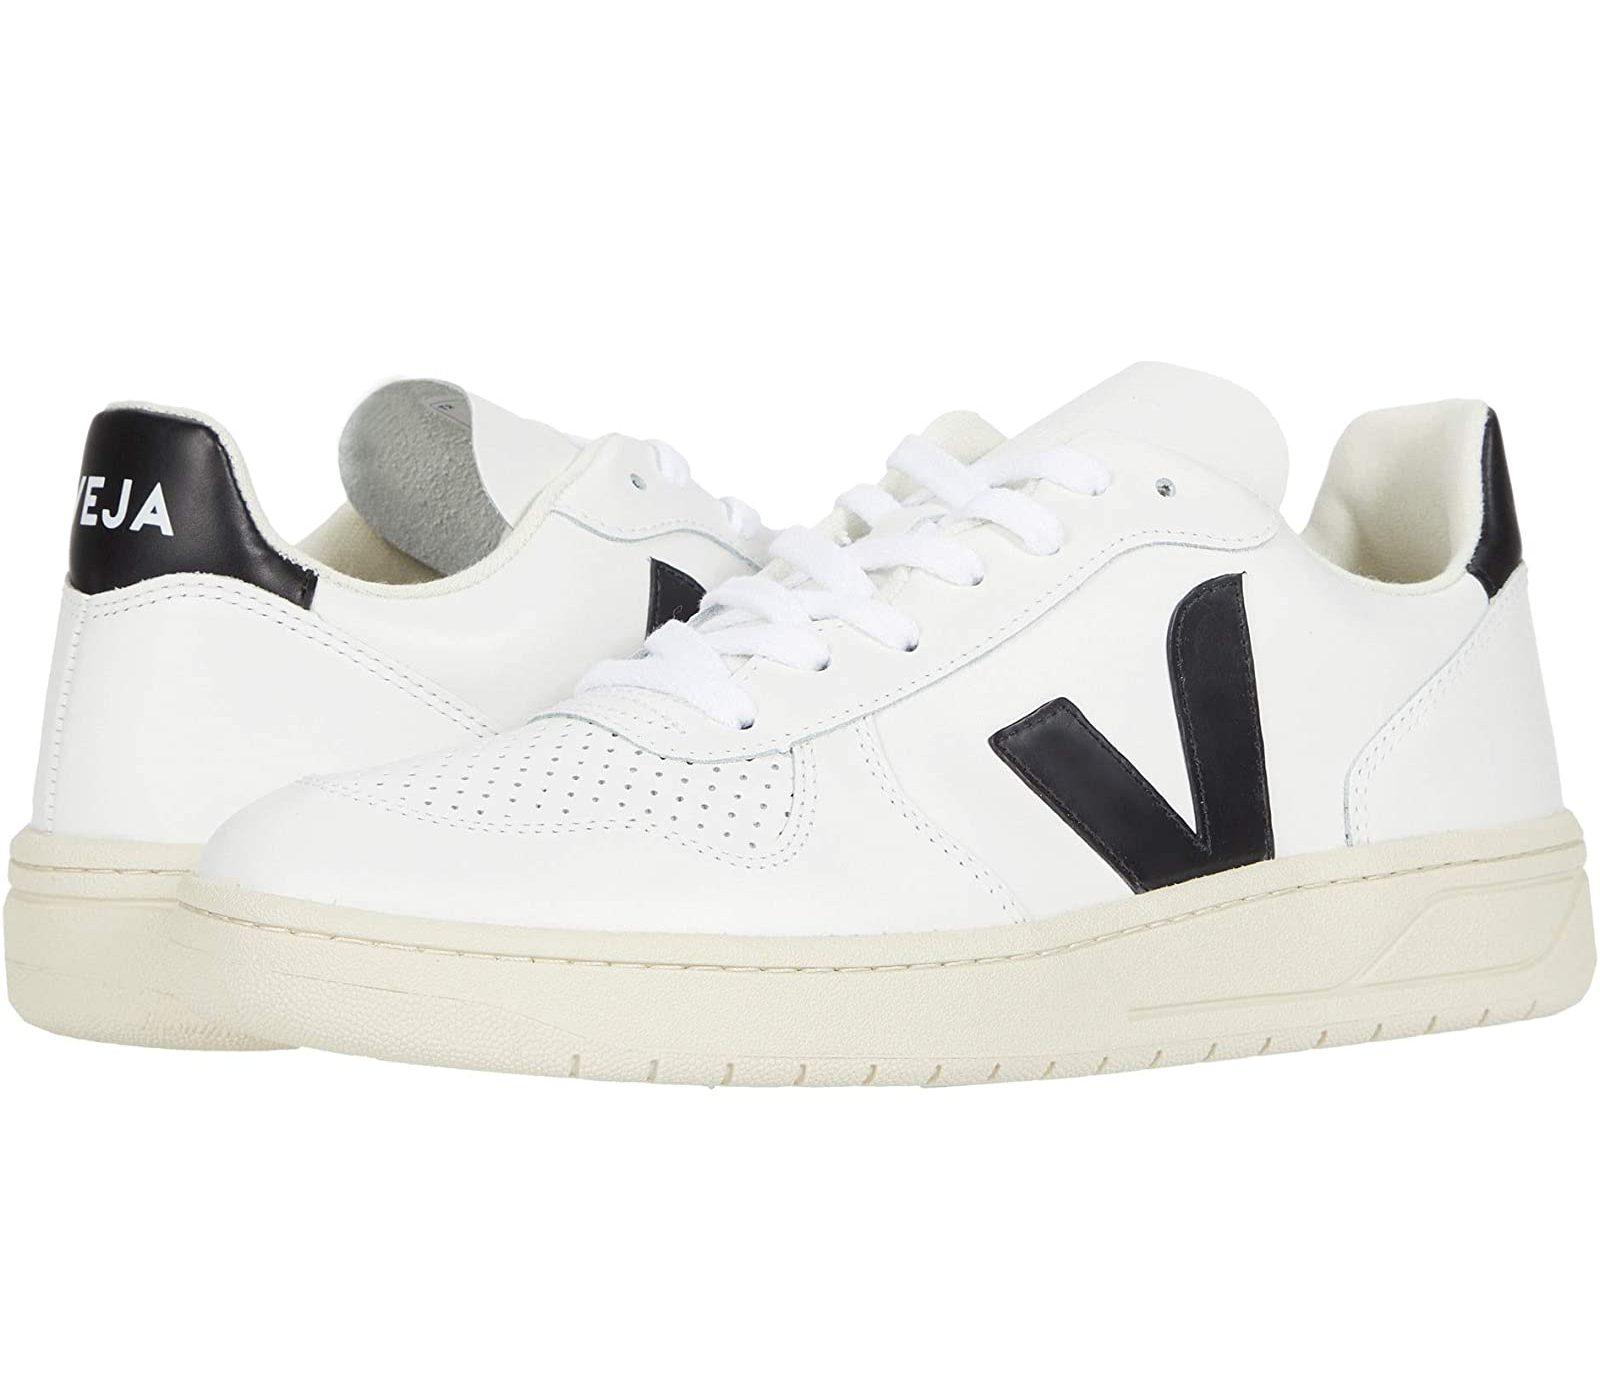 Veja sneakers white mens